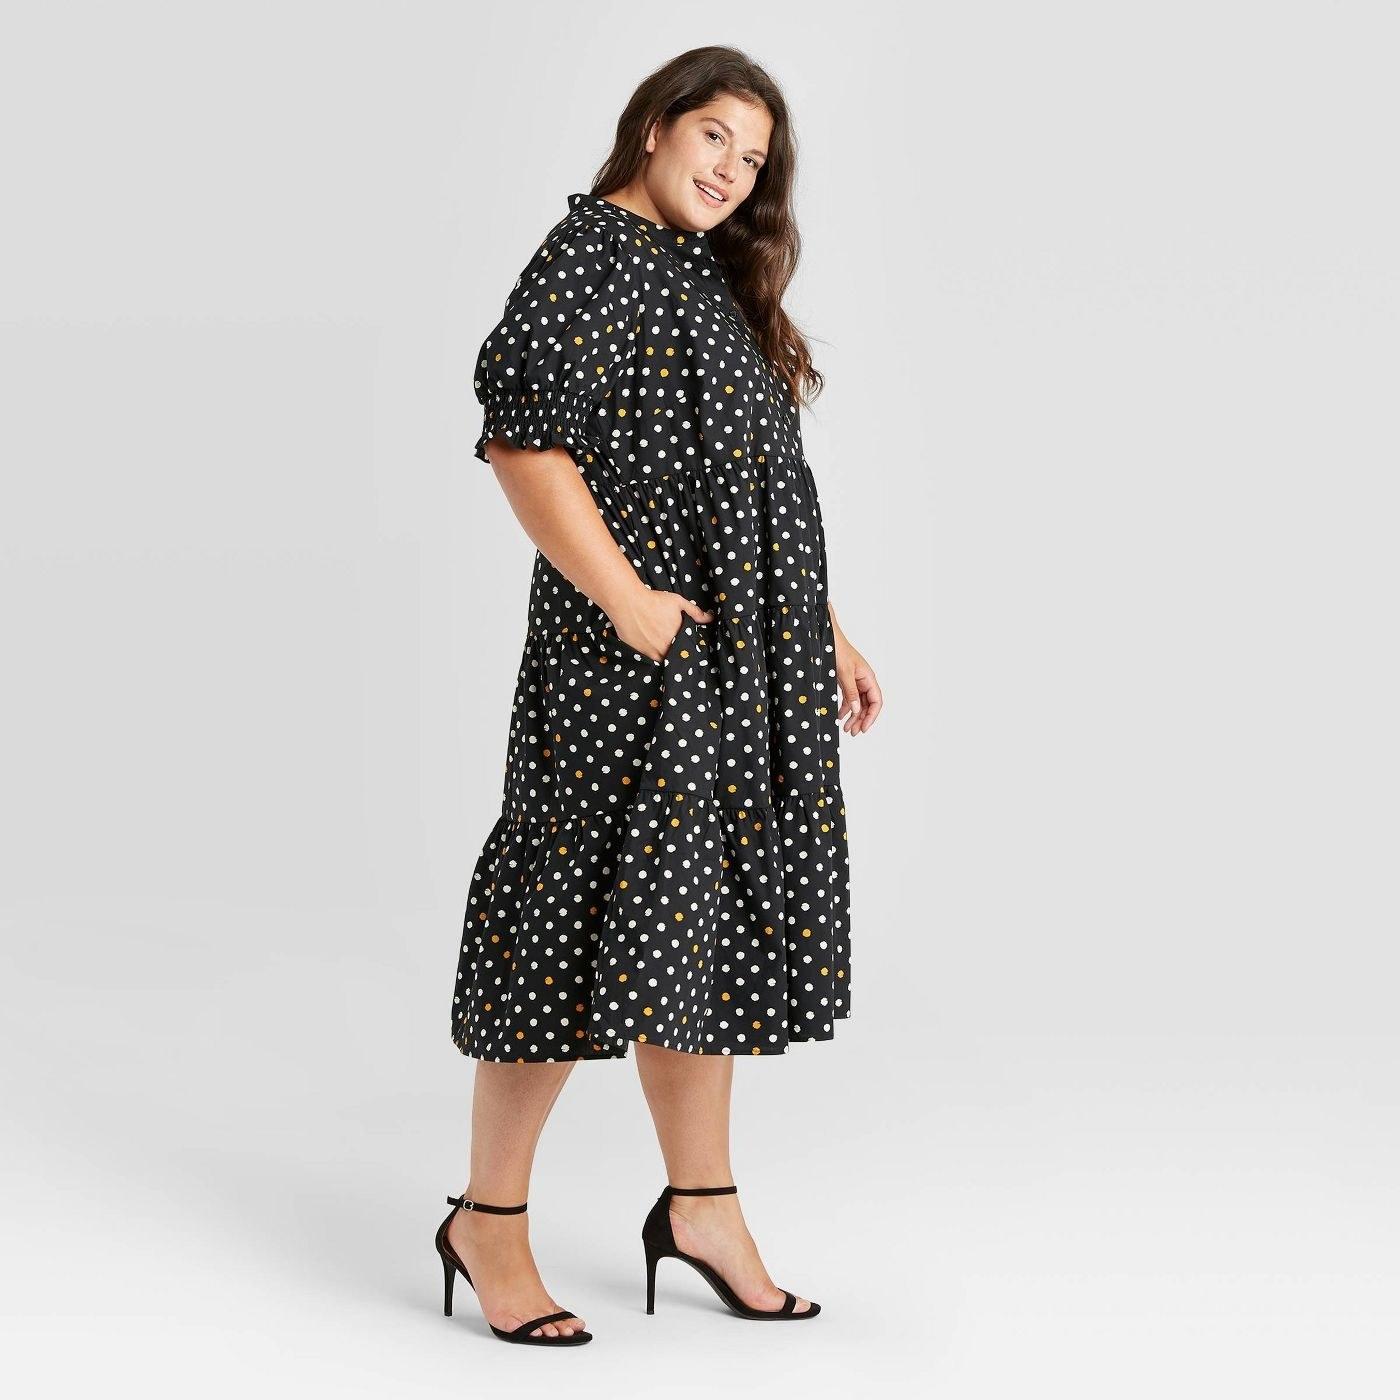 Model wearing polka dotted dress